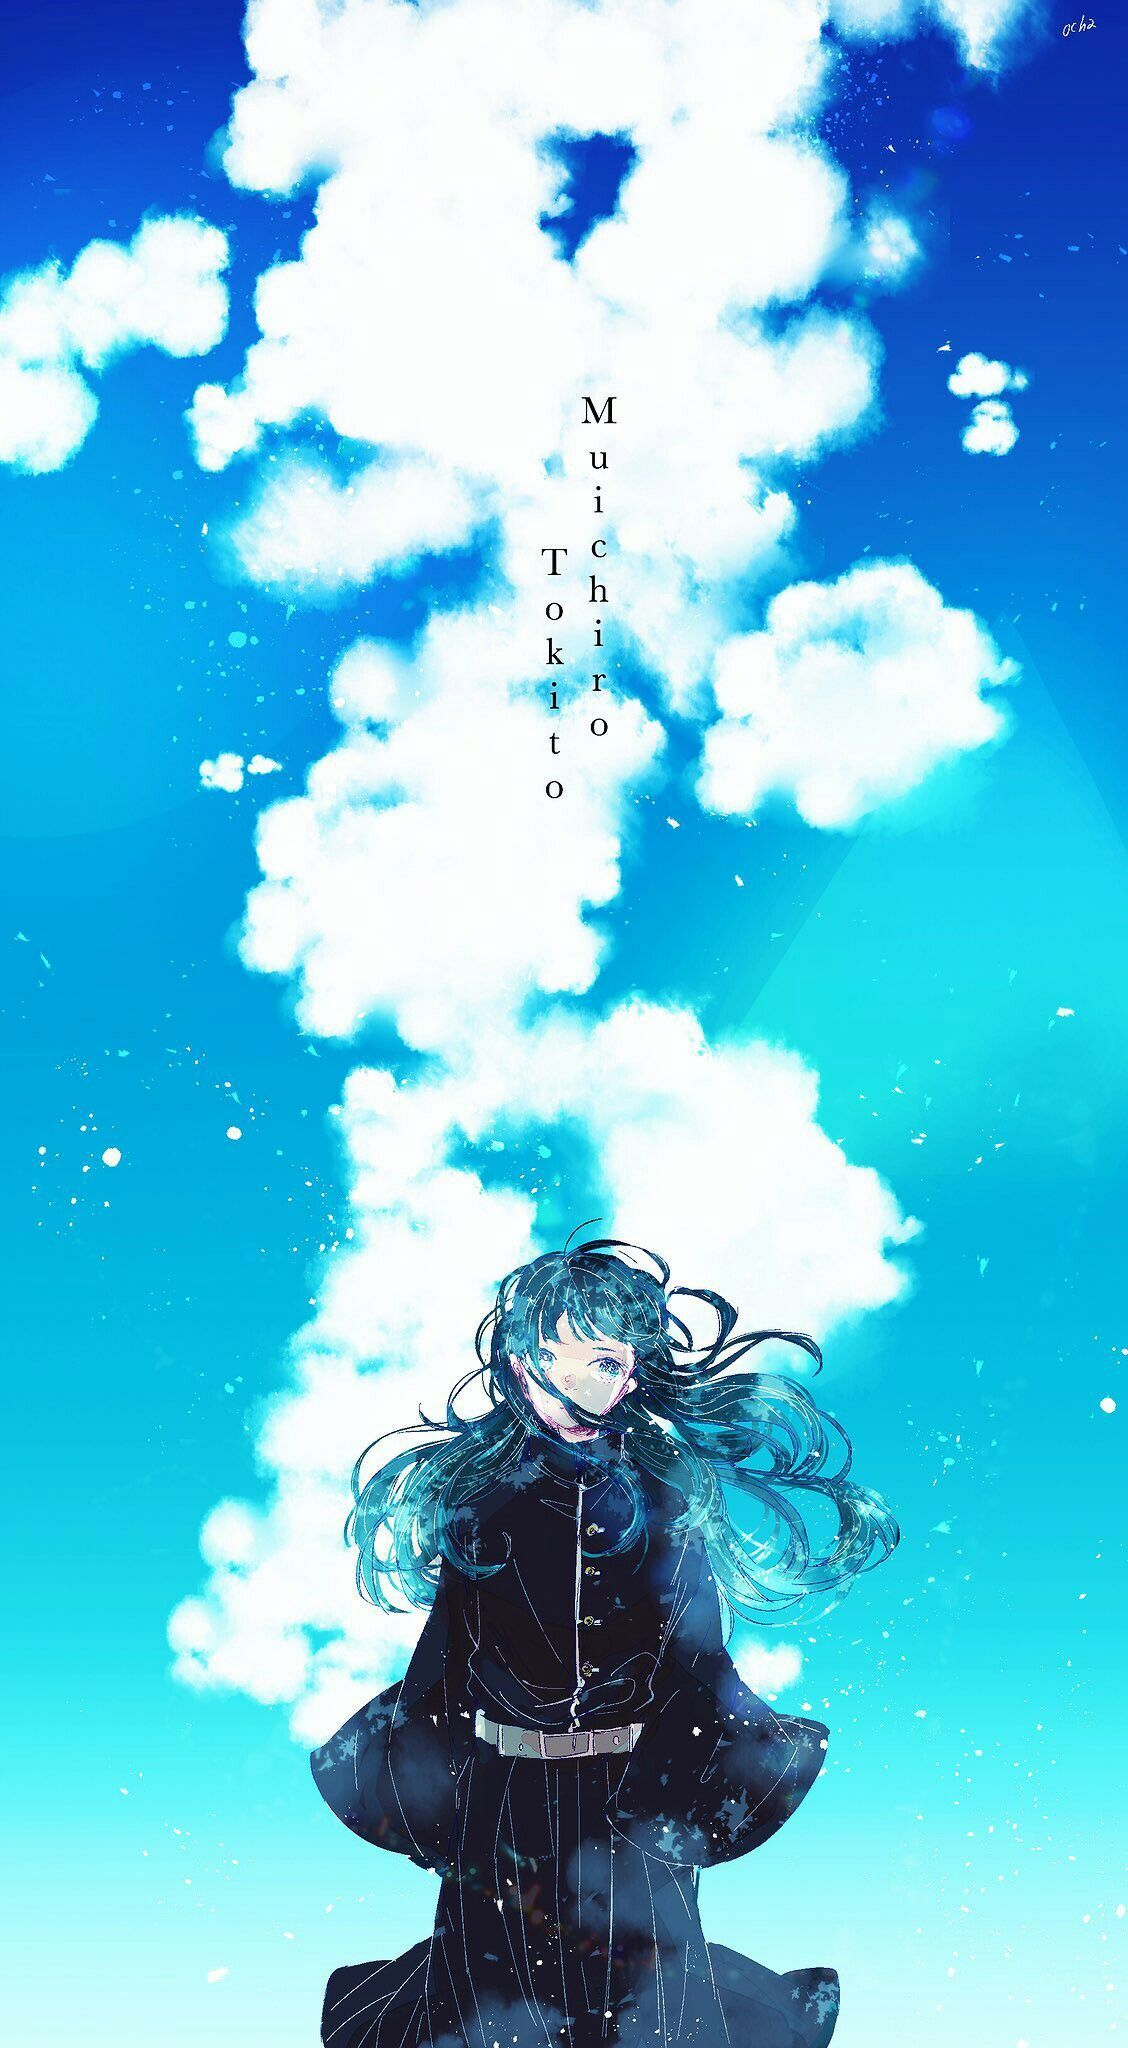 Tokitou Muichirou おしゃれまとめの人気アイデア Pinterest ダイ キルト 壁紙 アニメ かっこいい 壁紙 アニメ 壁紙 アート